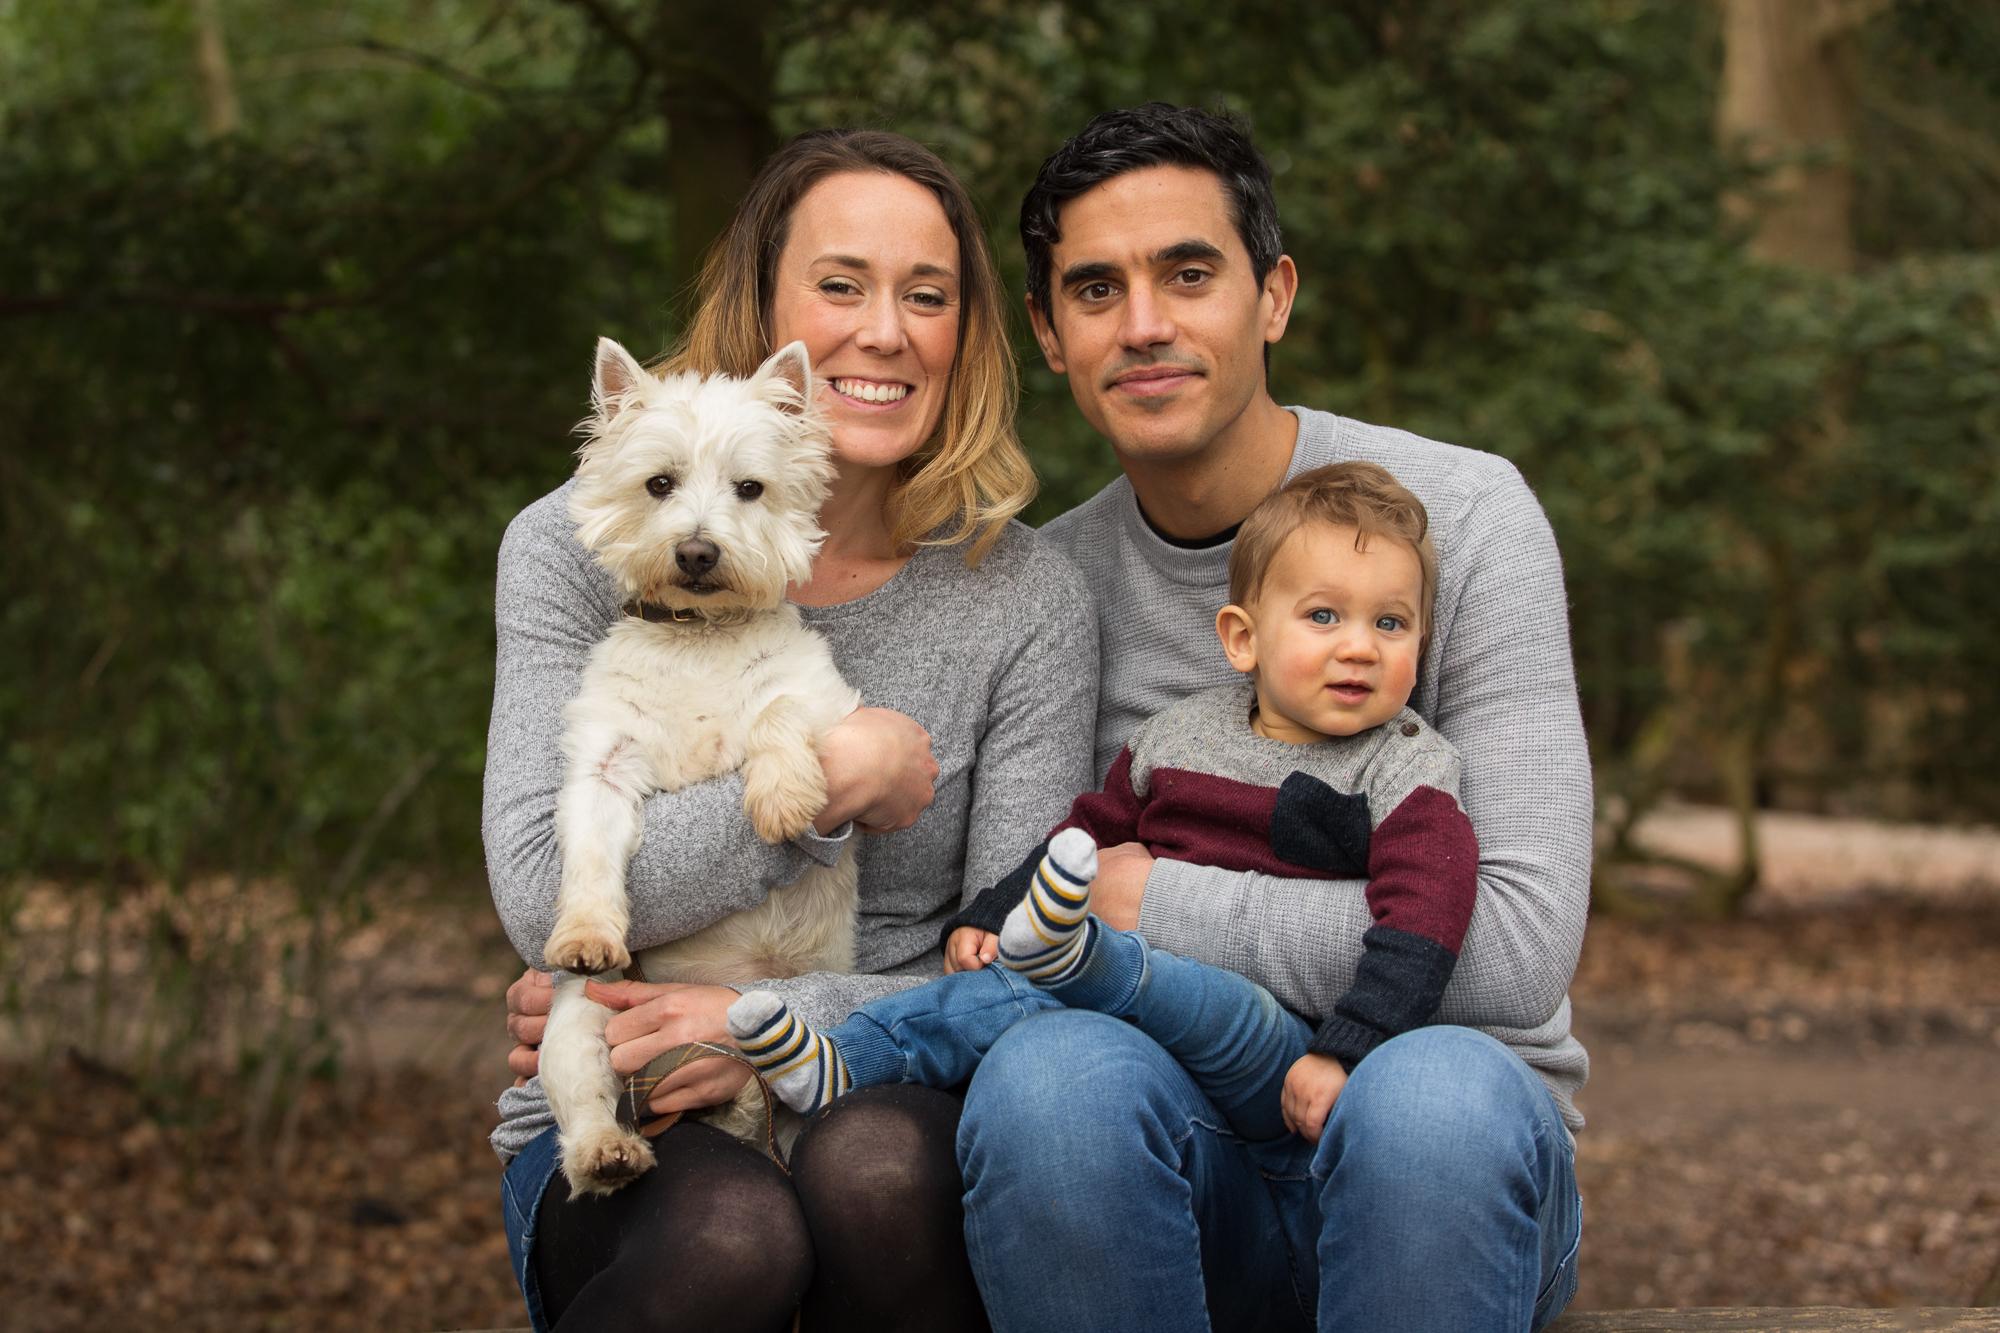 Family Portrait at Box Hill